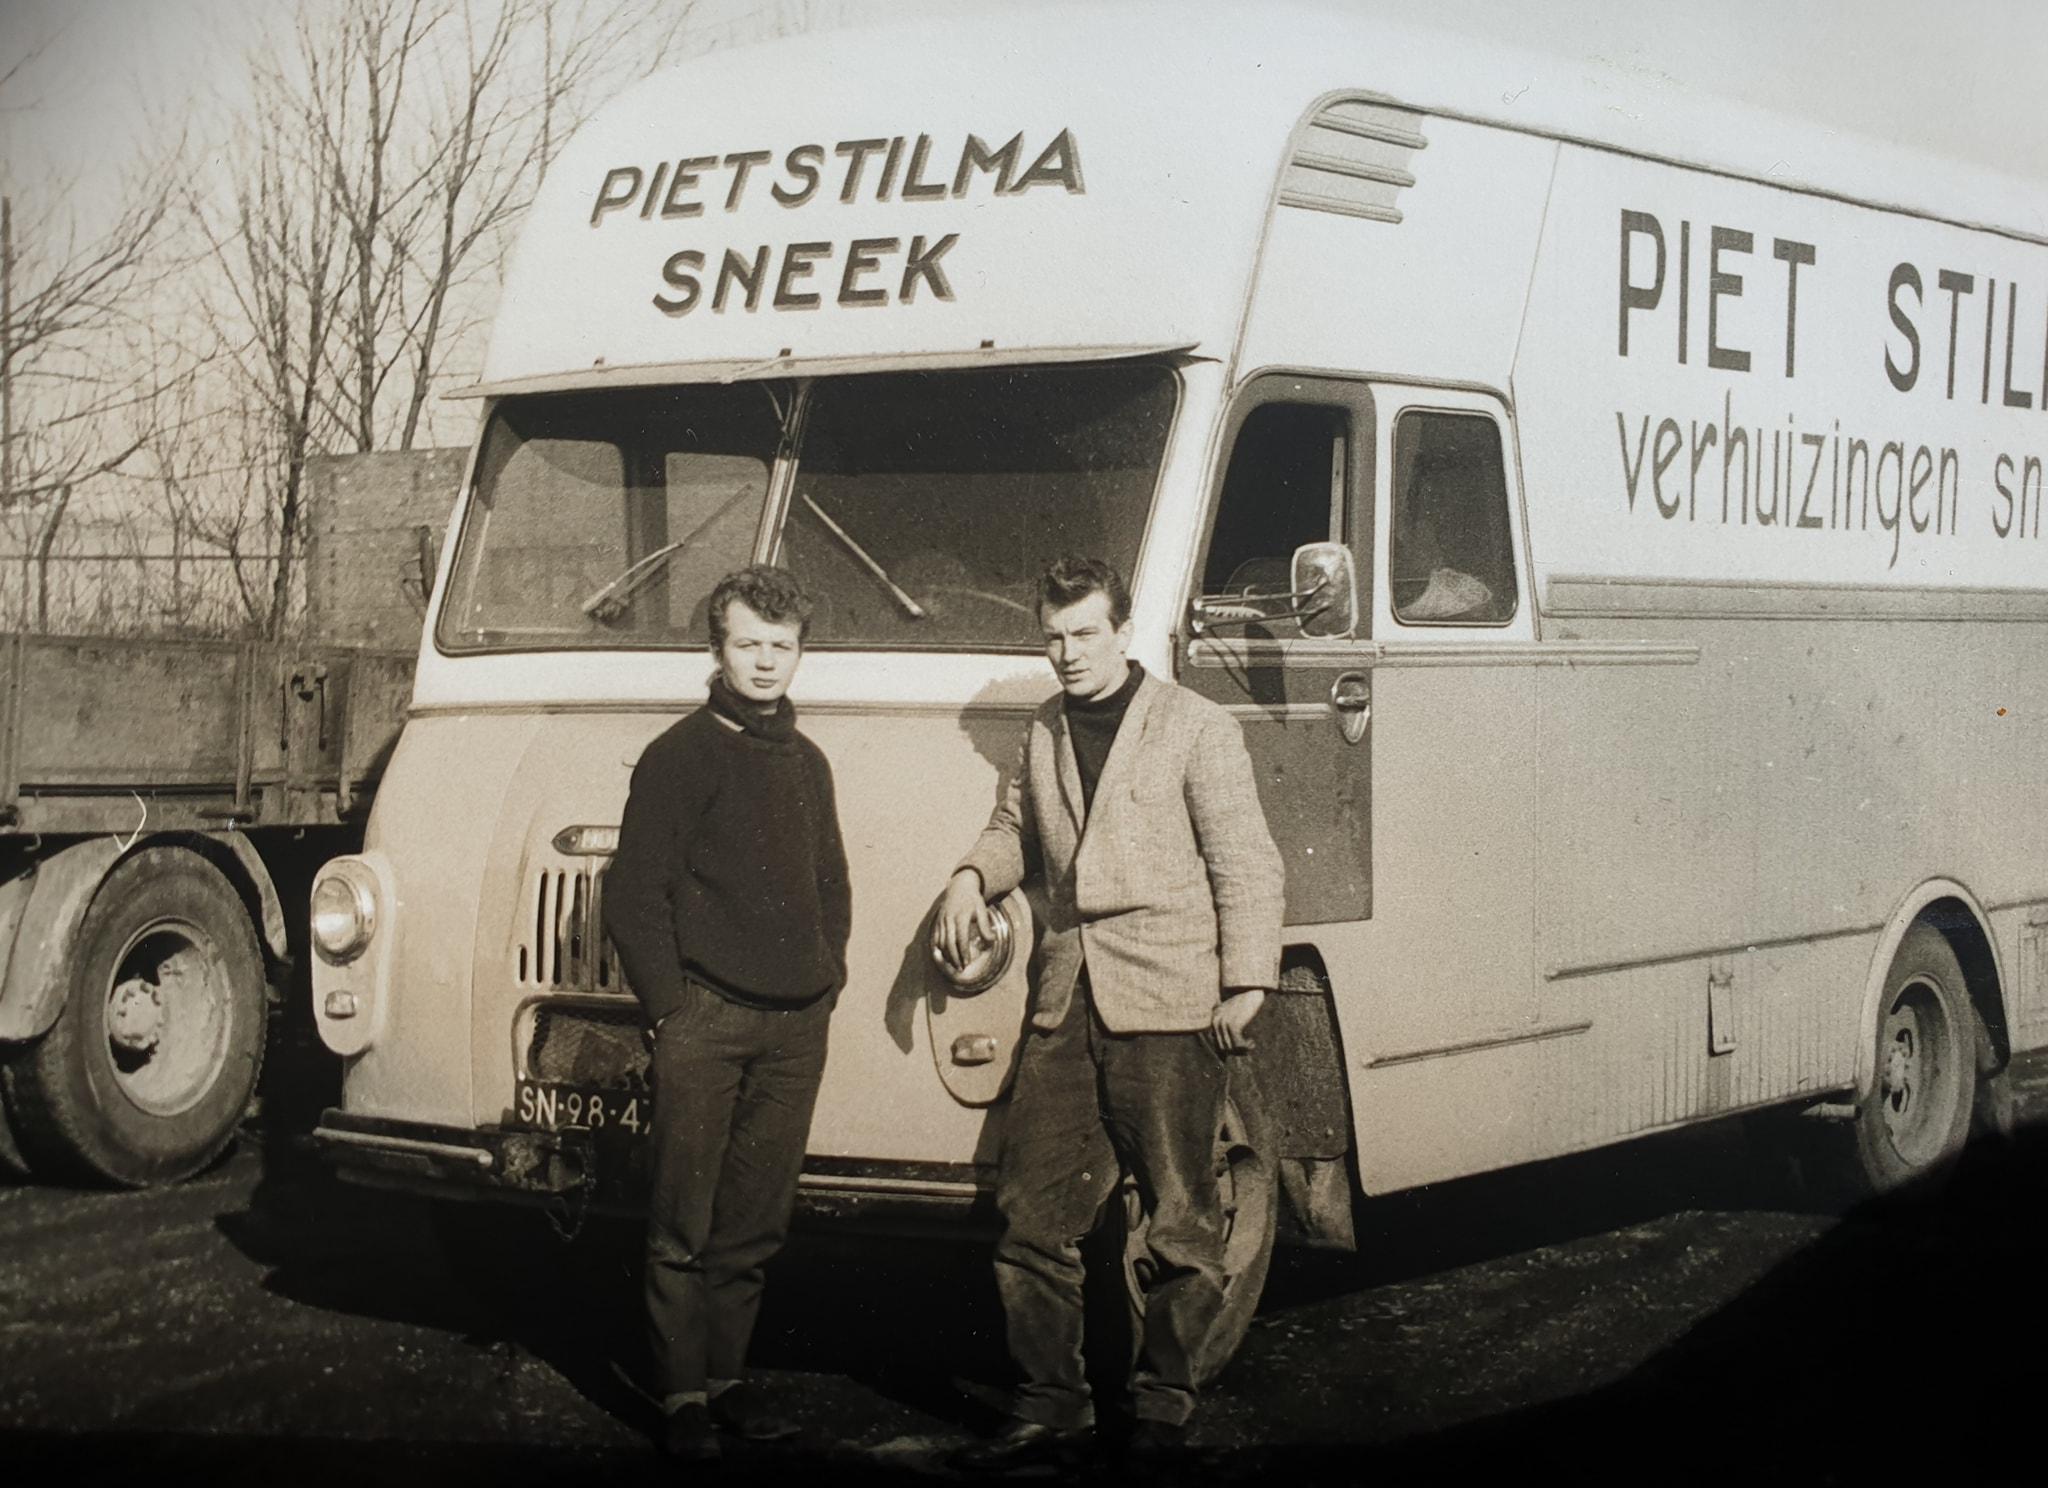 Piet-Stilma